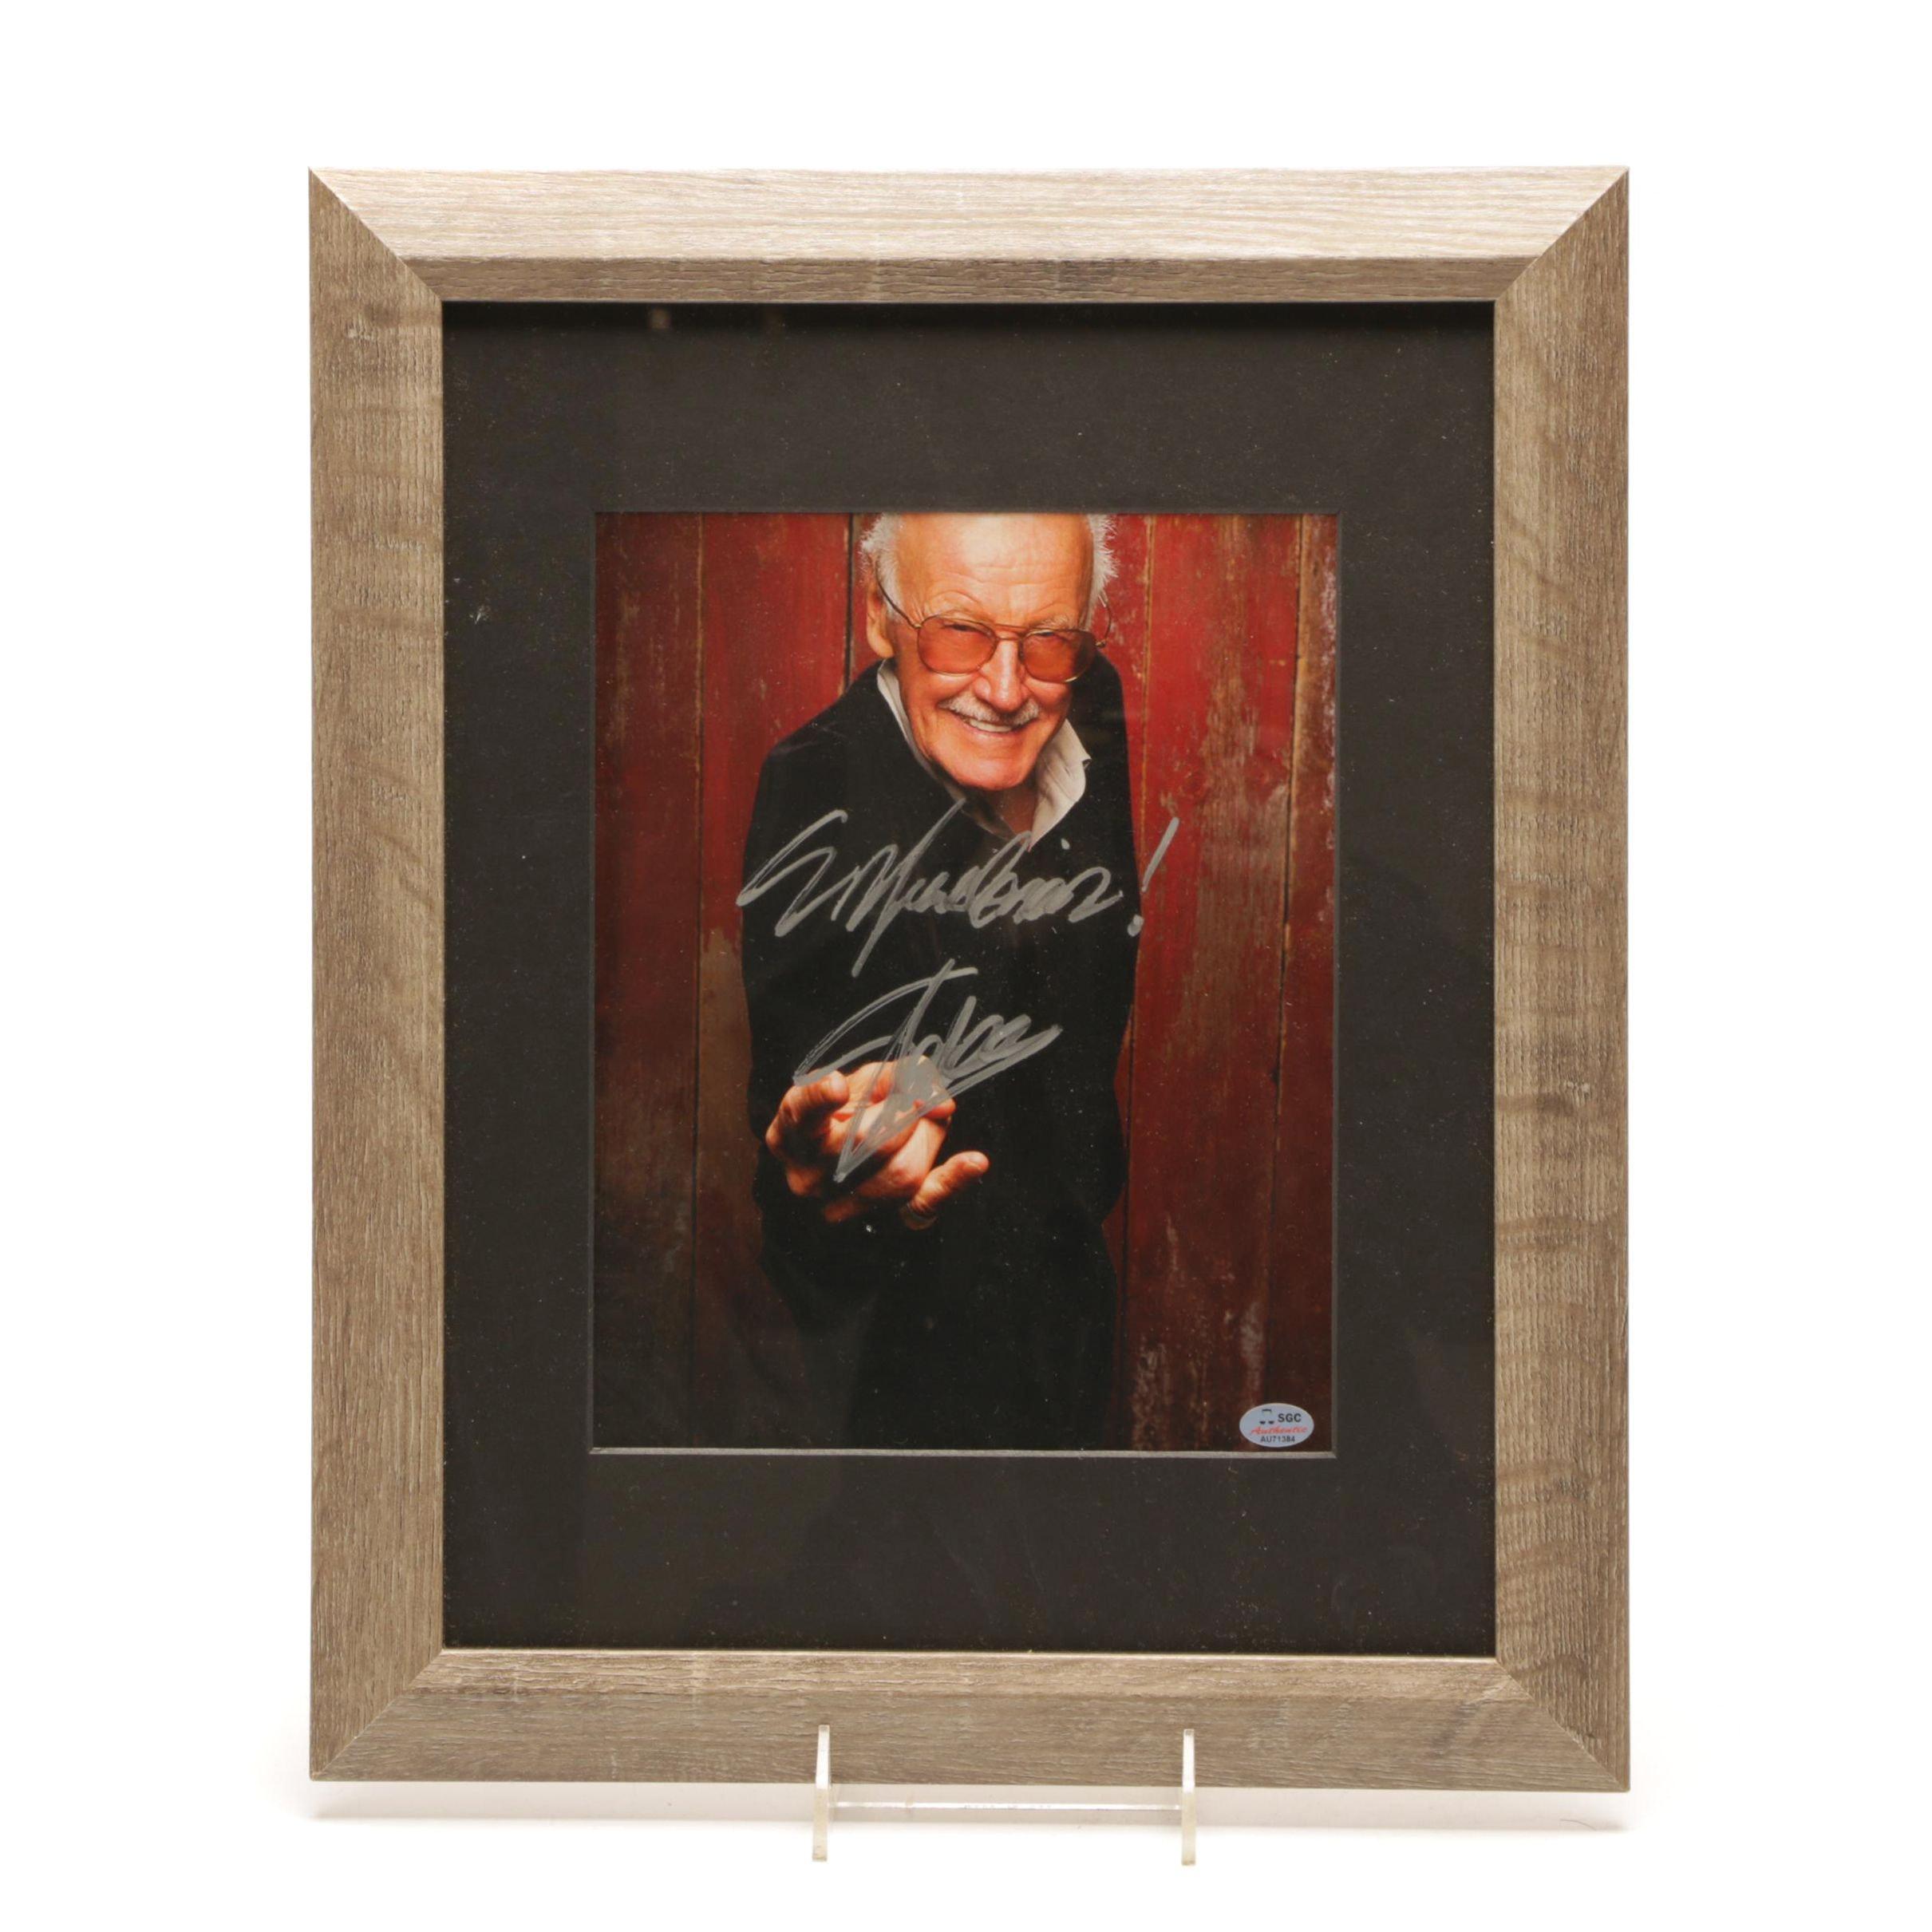 Stan Lee Signed Framed Photo Print COA